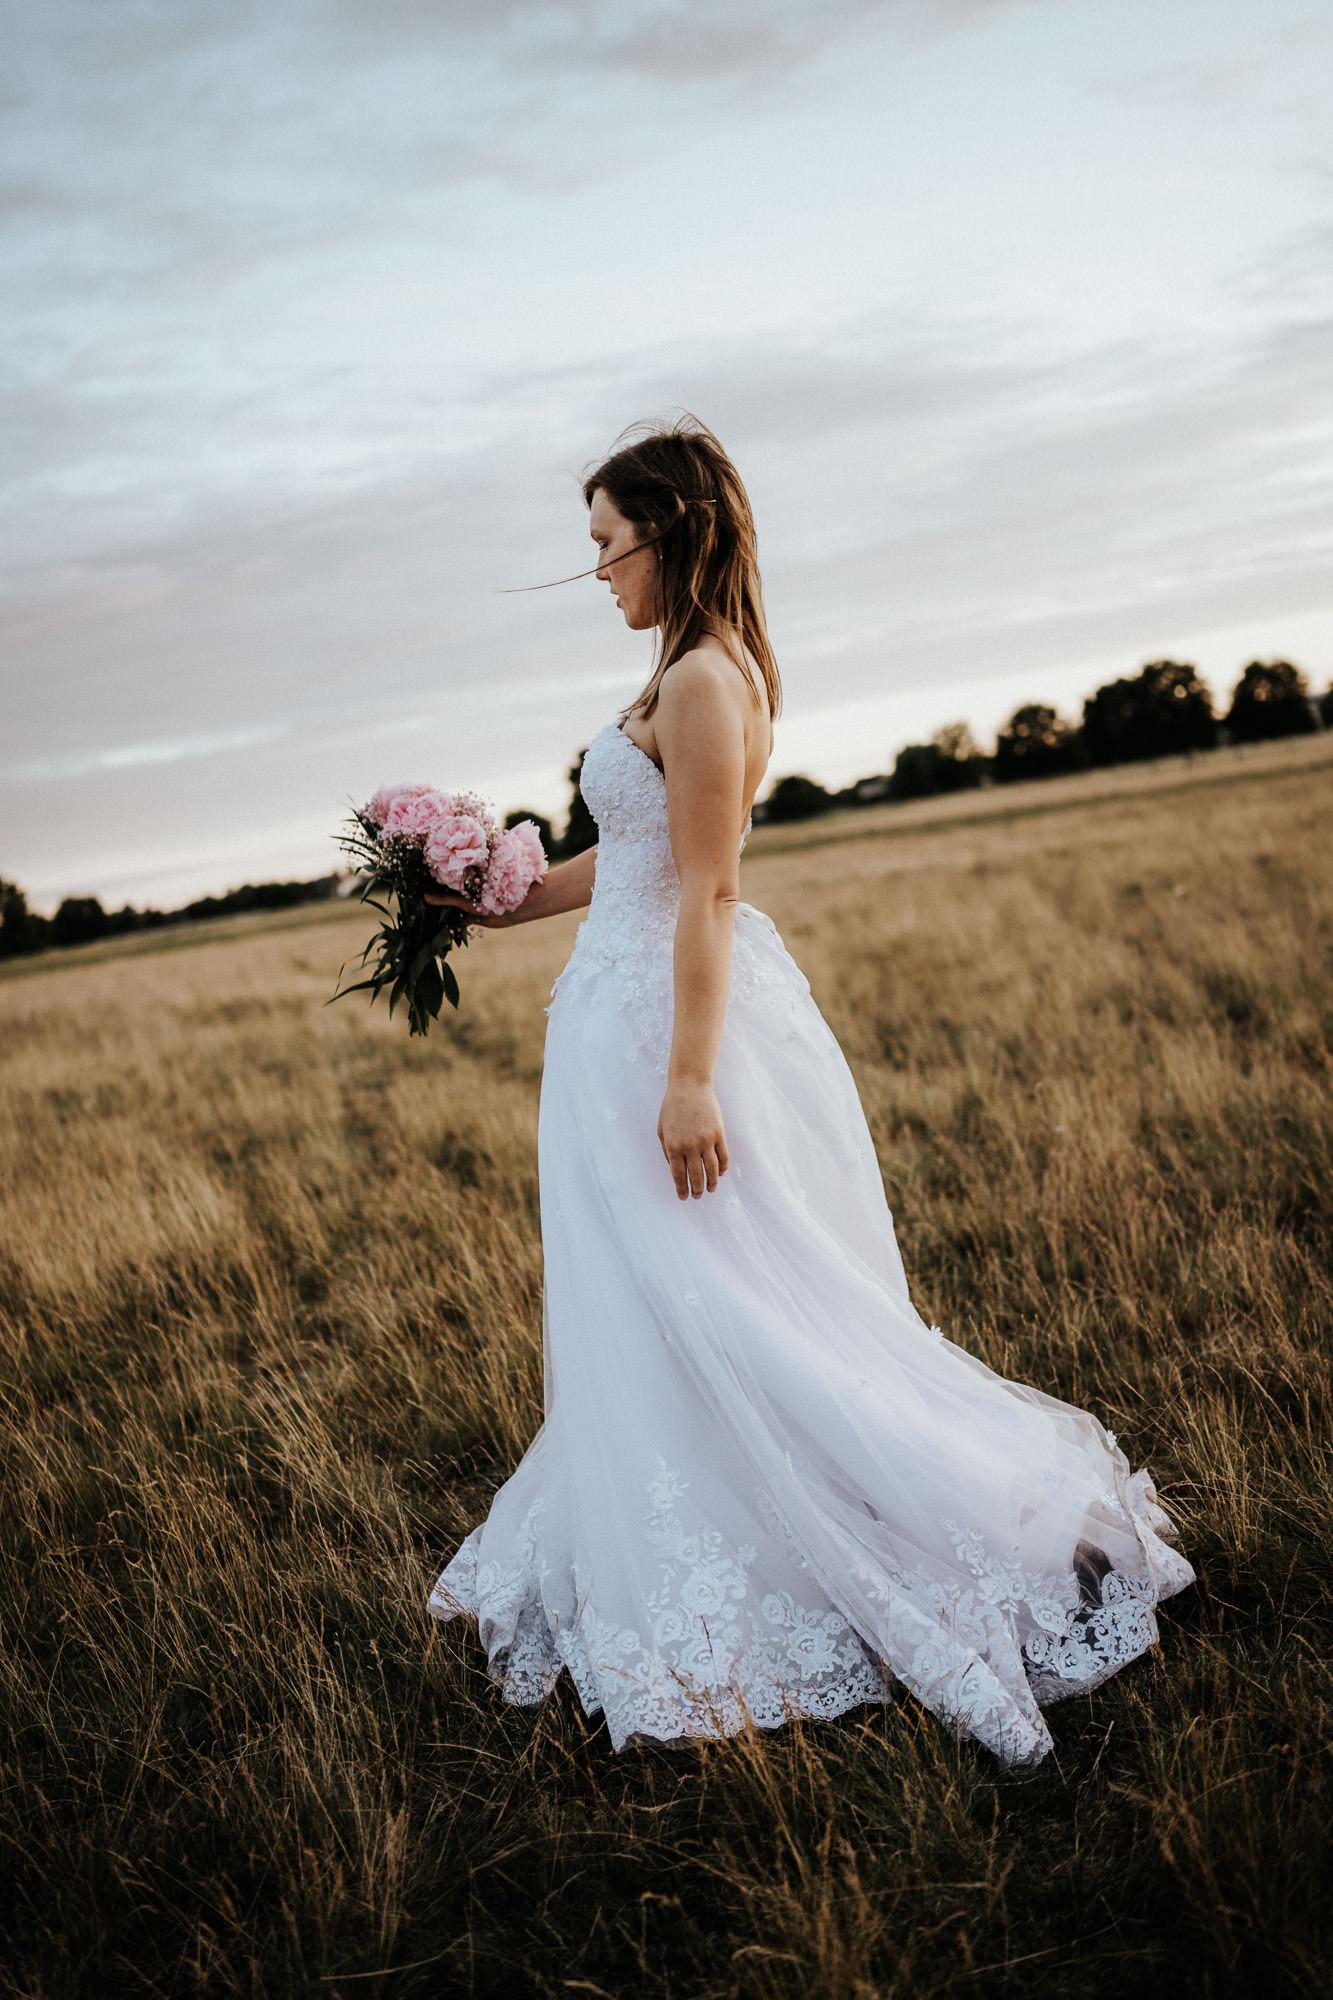 waltsmedia-hochzeitsreportage-after-wedding-shooting-berlin-22